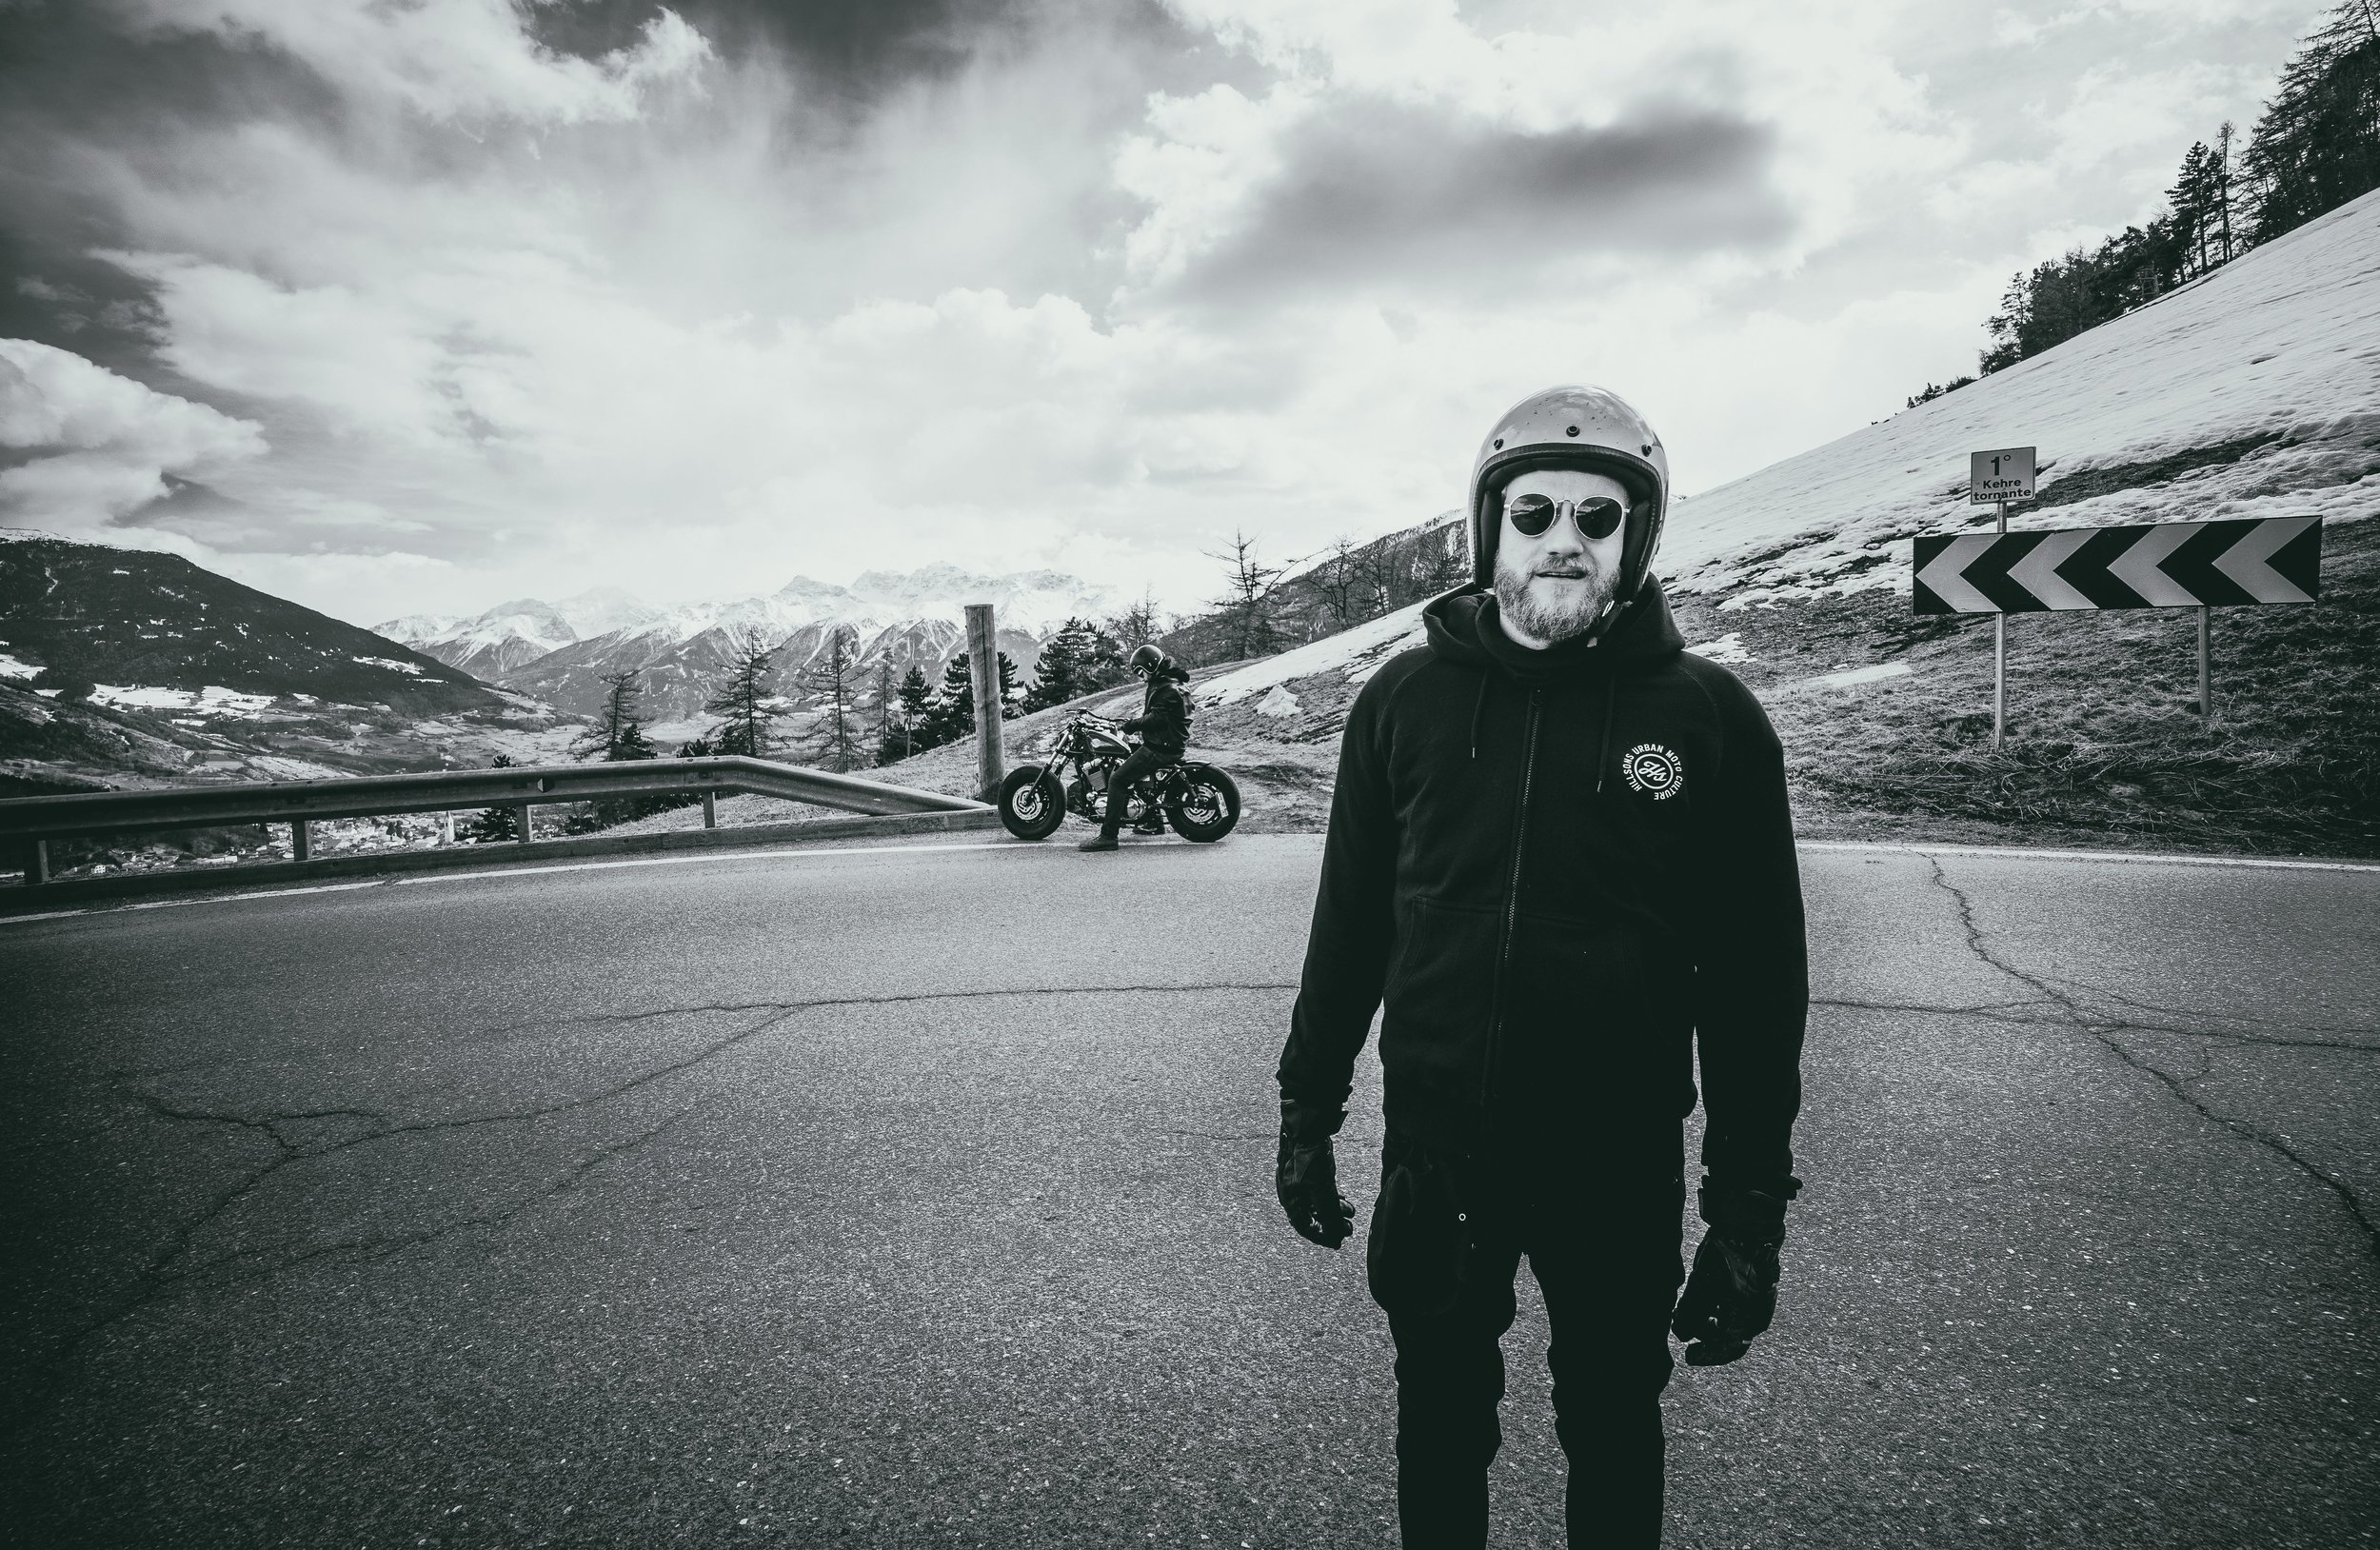 roadtrip_motorcycle_reportage_portrait_men_monochrome-leica.jpg